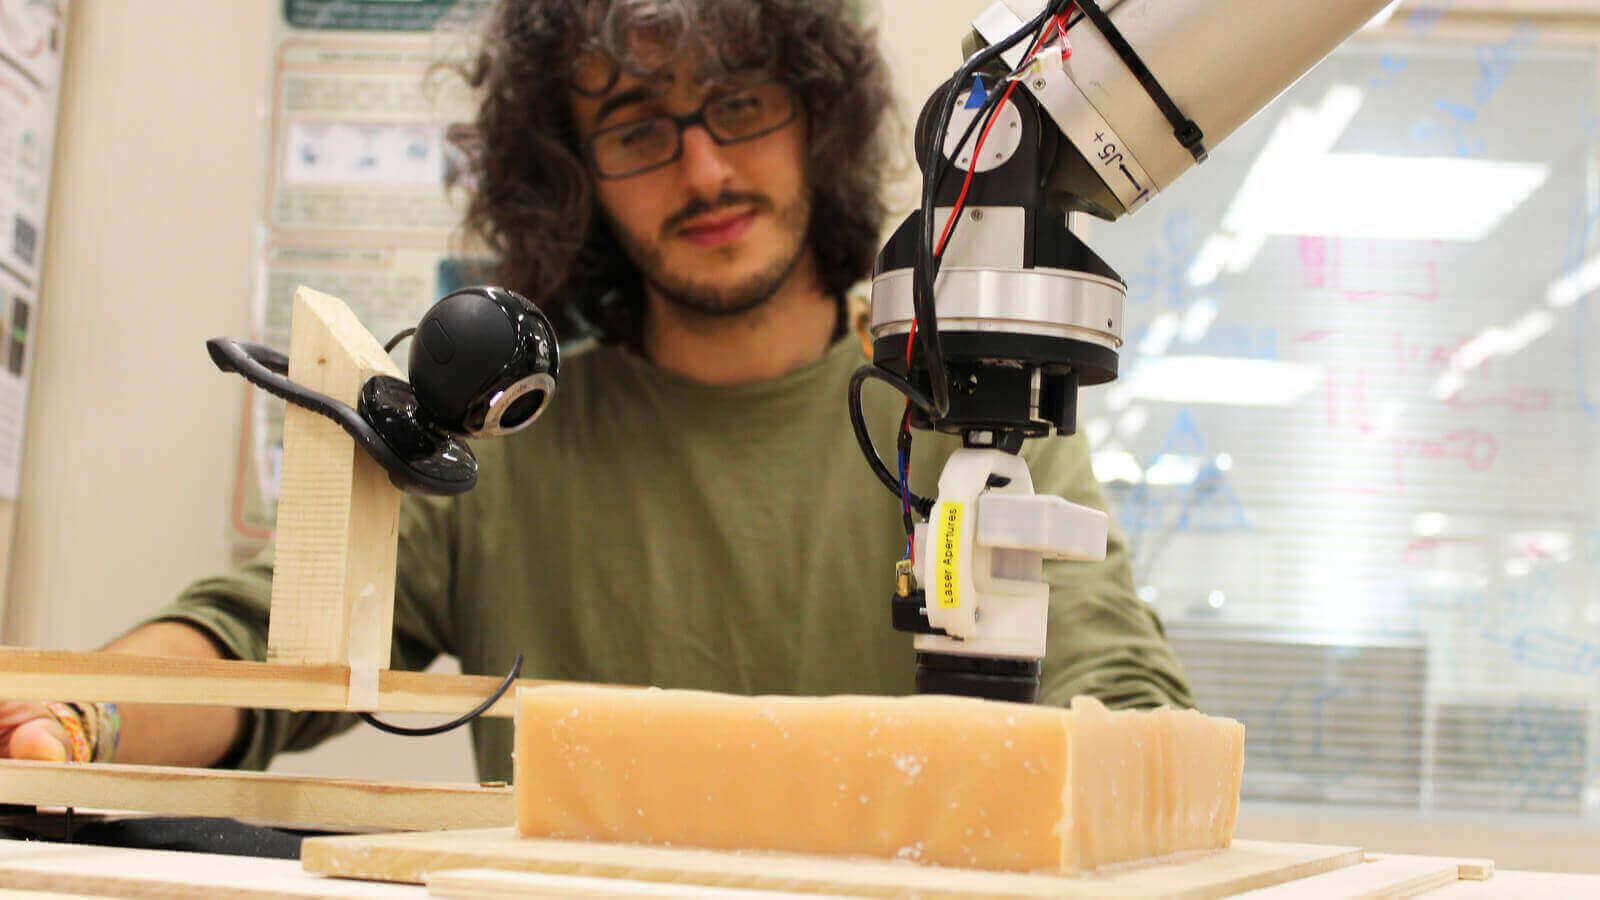 TacTip Wins Harvard International Soft Robotics Competition | All3DP